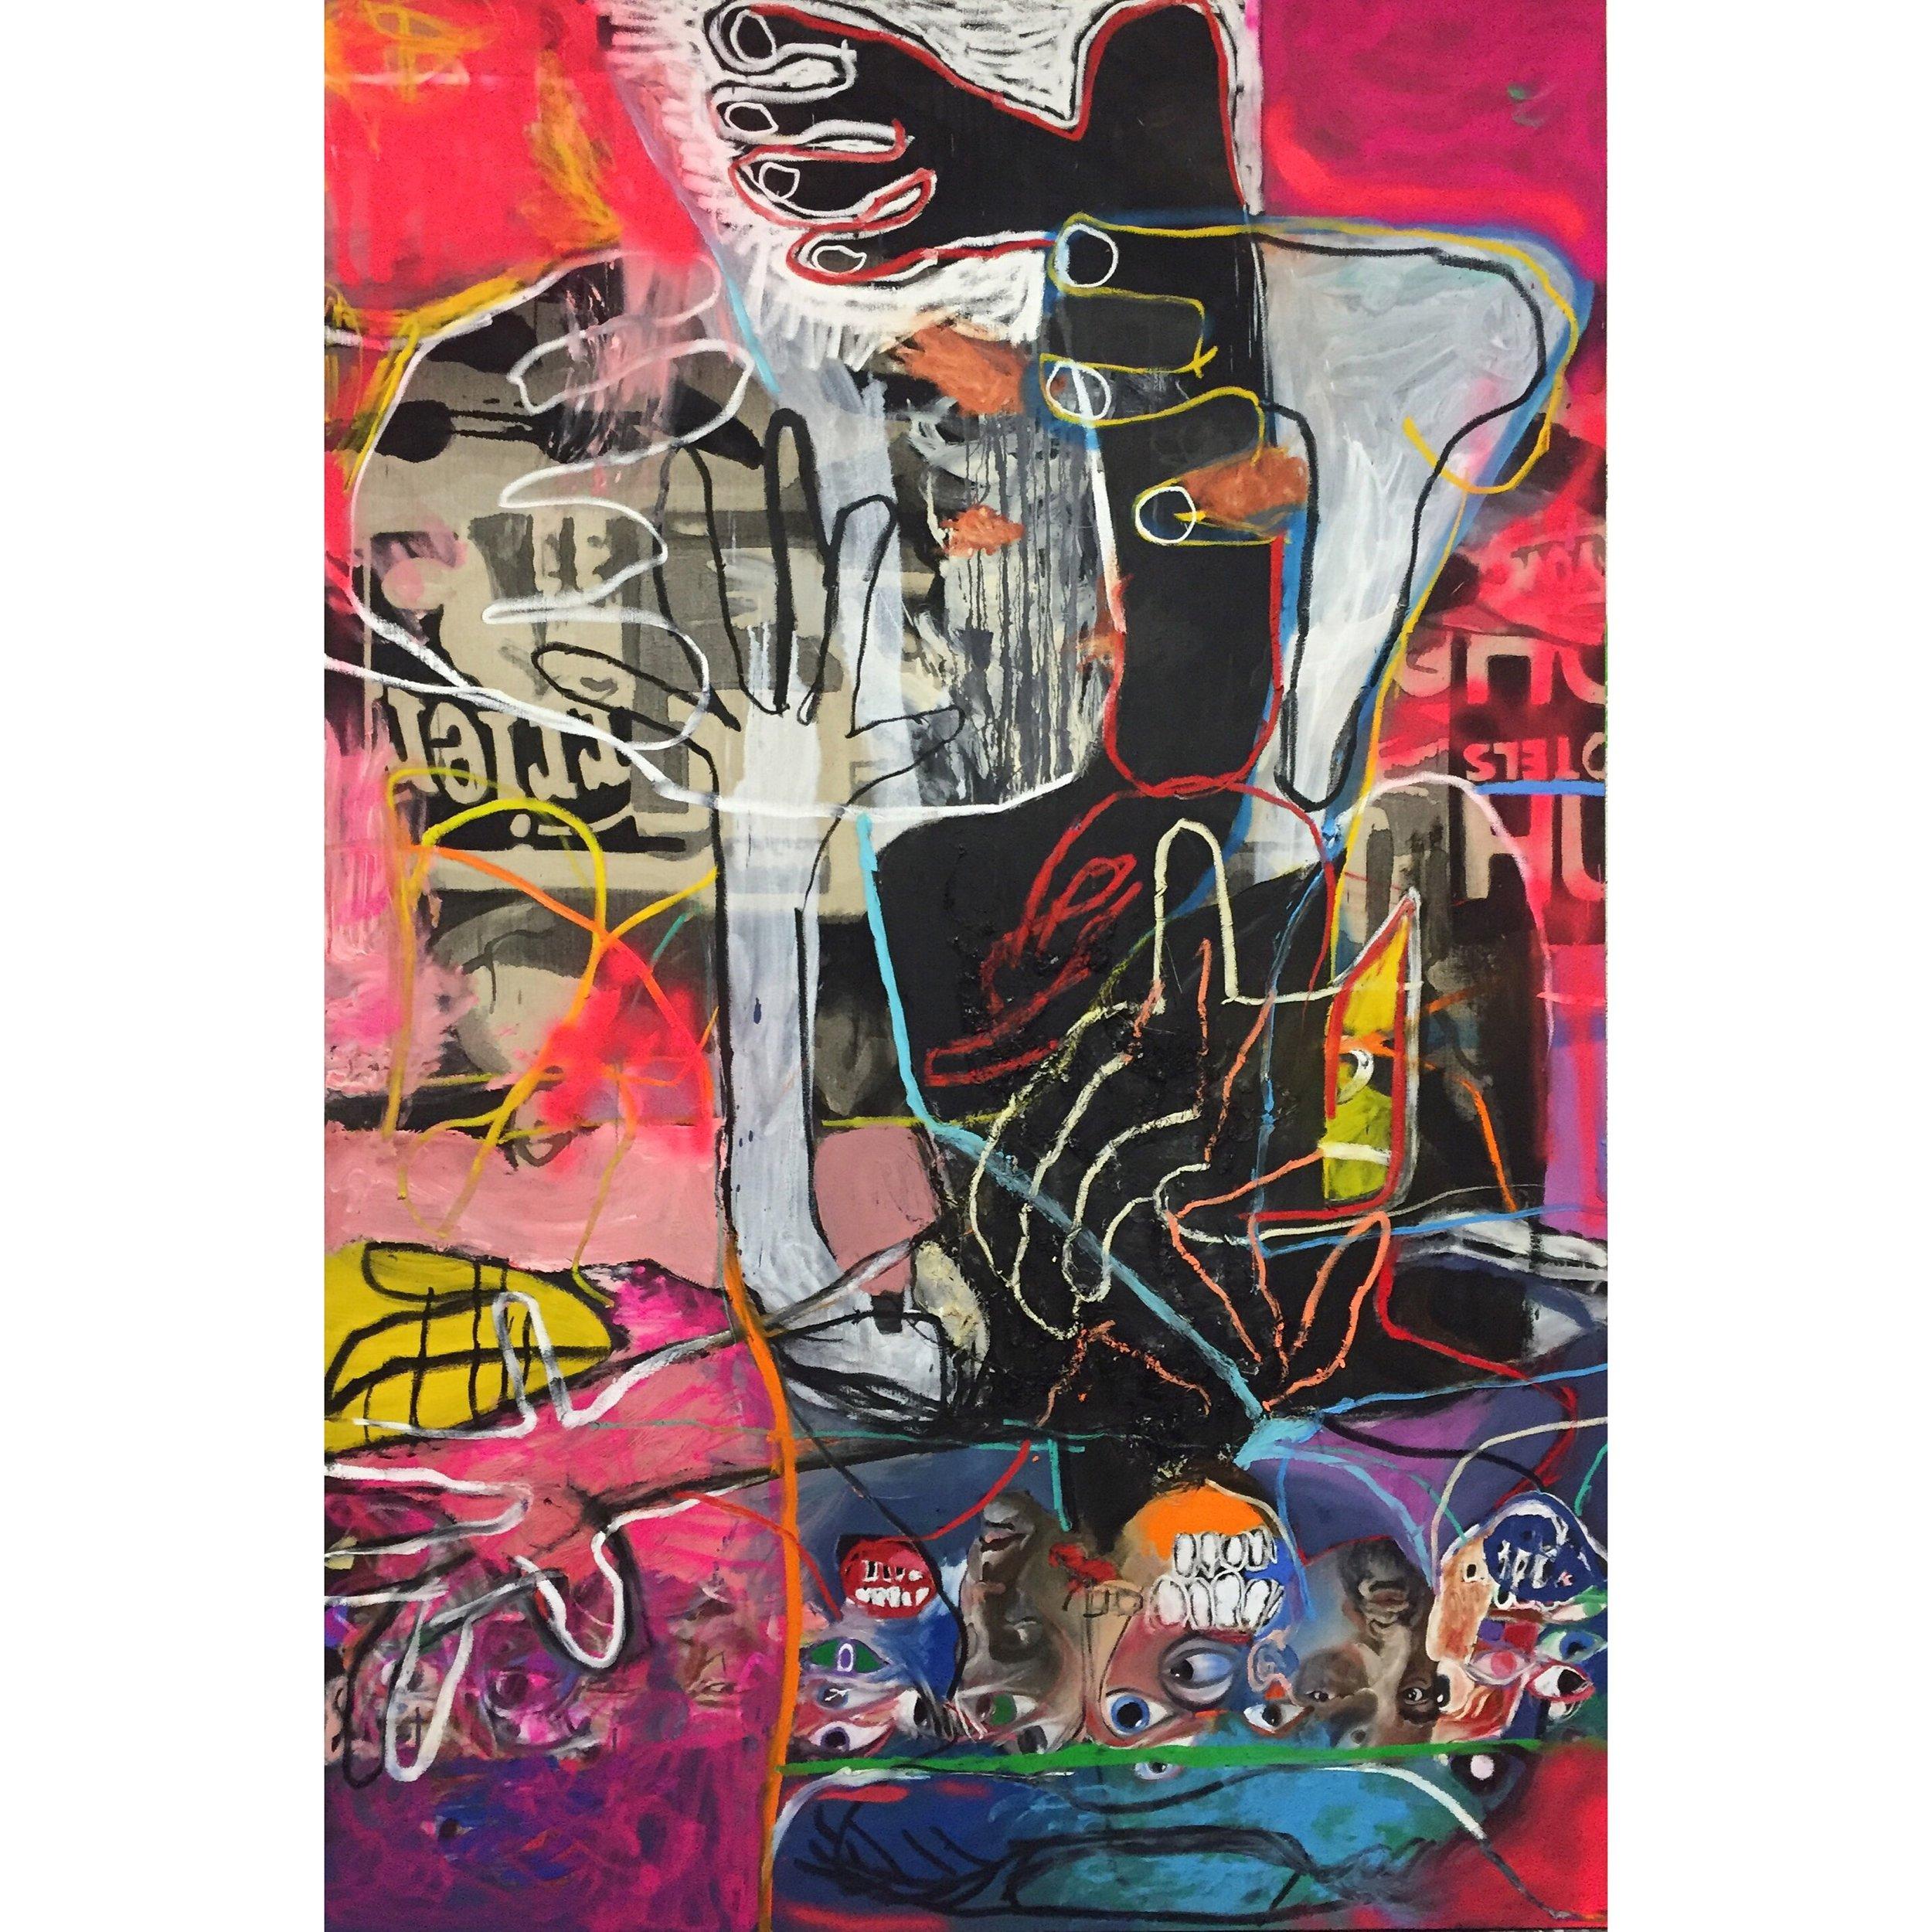 Oil, Acrylic, and Spray Paint on Canvas  83 x 55 in  210 x 140 cm